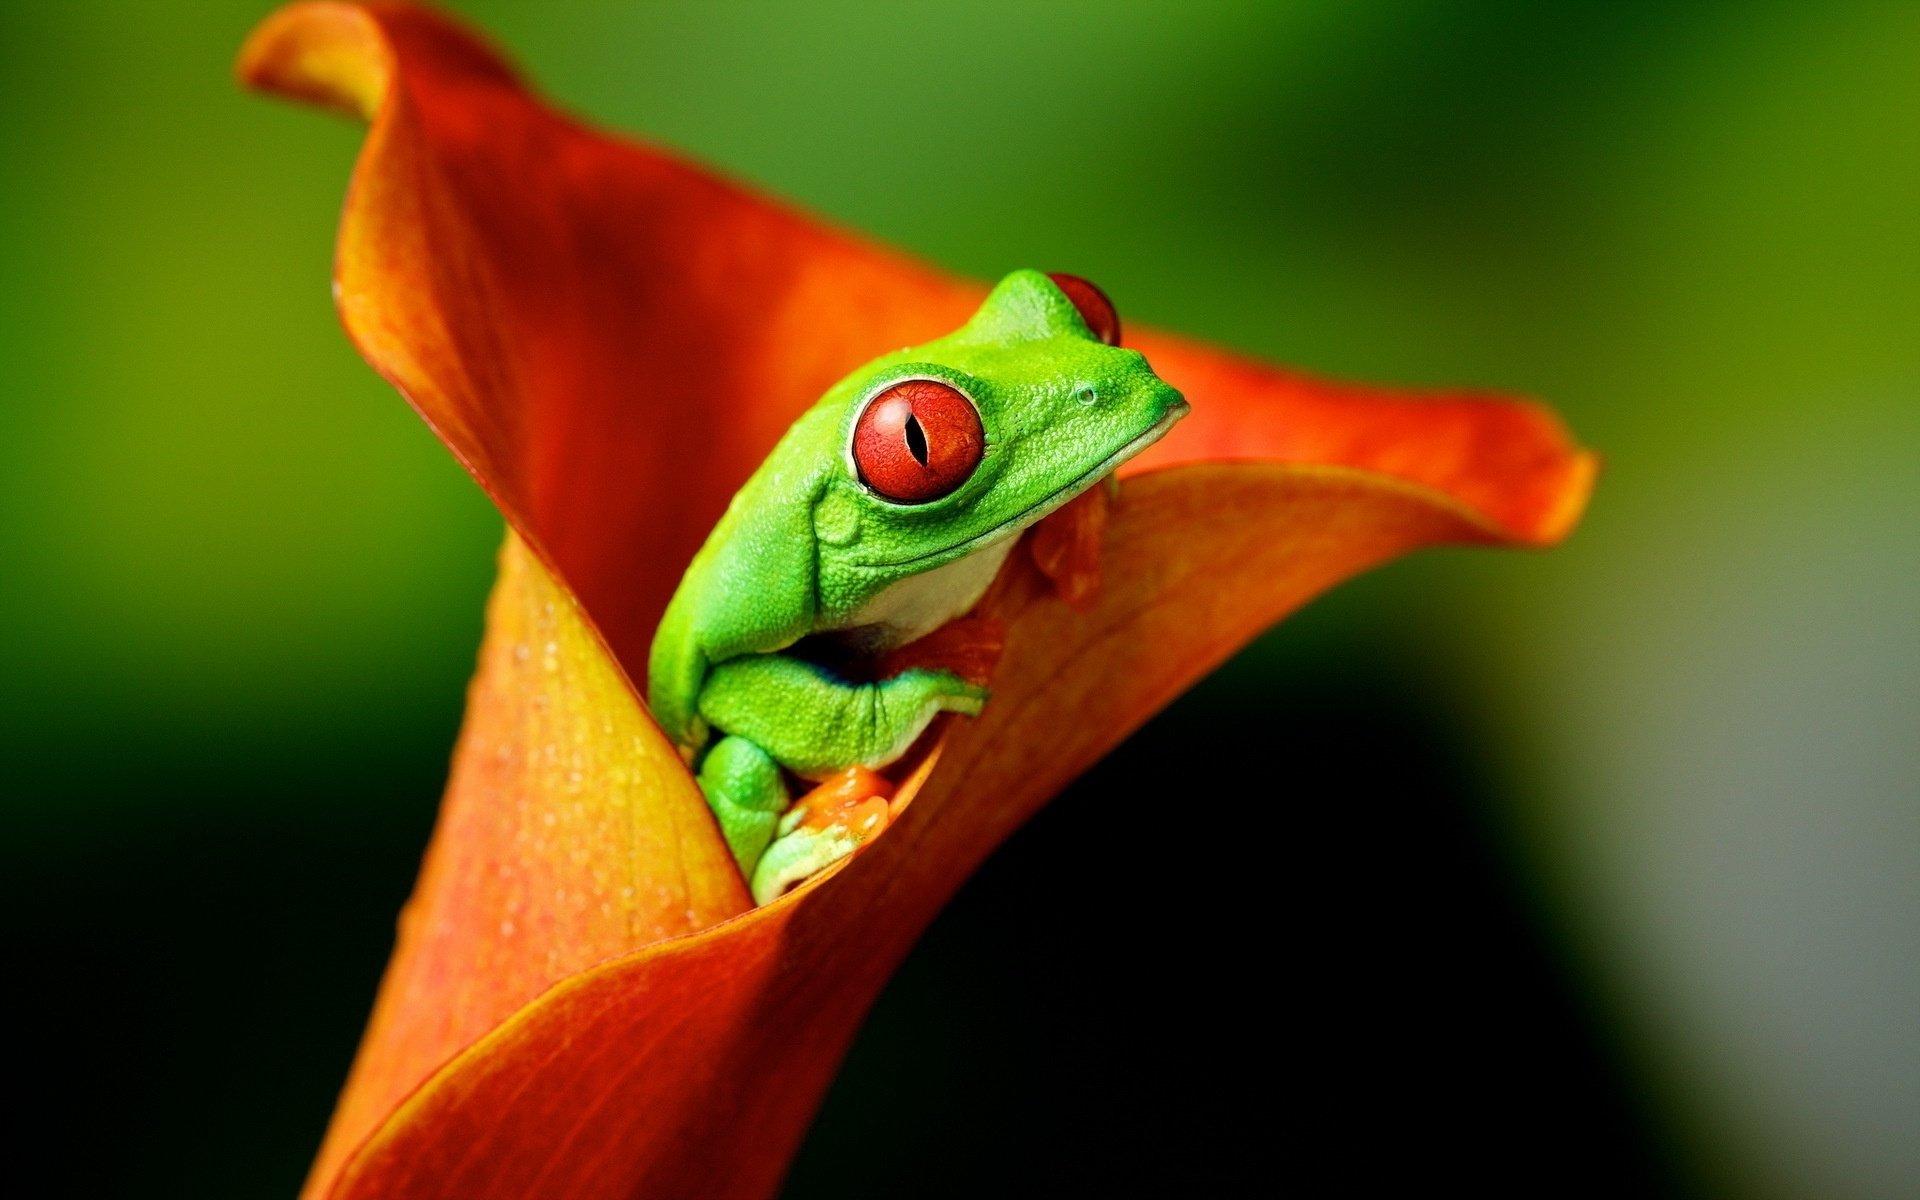 Animal - Red Eyed Tree Frog  Animal Red-Eyed Tree Frog Tree Frog Frog Flower Calla Lily Orange Flower Wallpaper